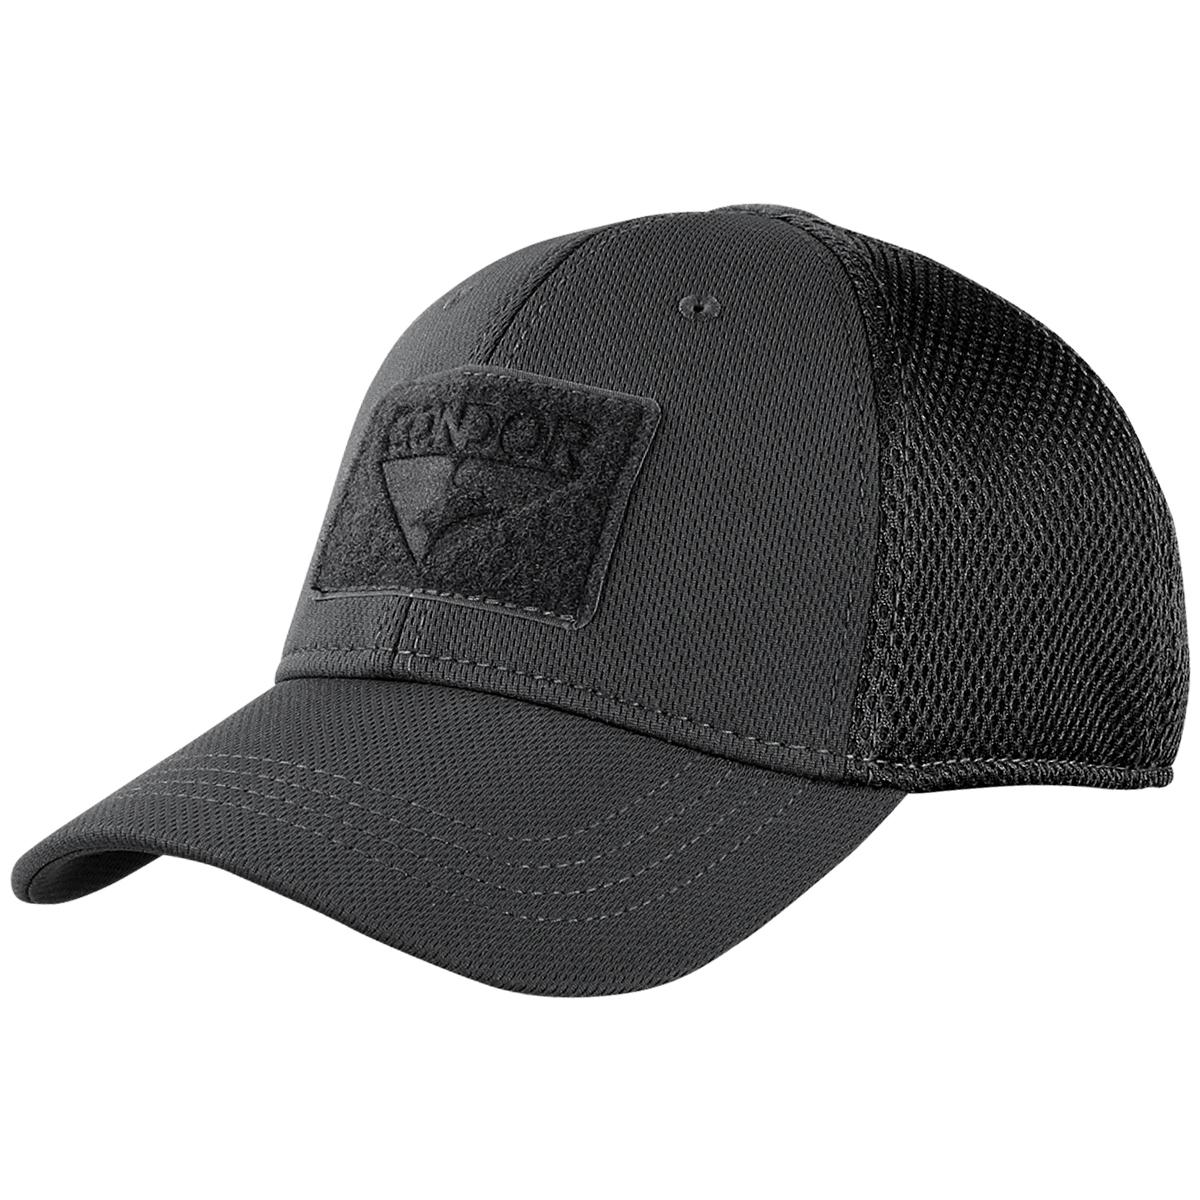 Condor Flex Cap Baseball Army Security Police Military